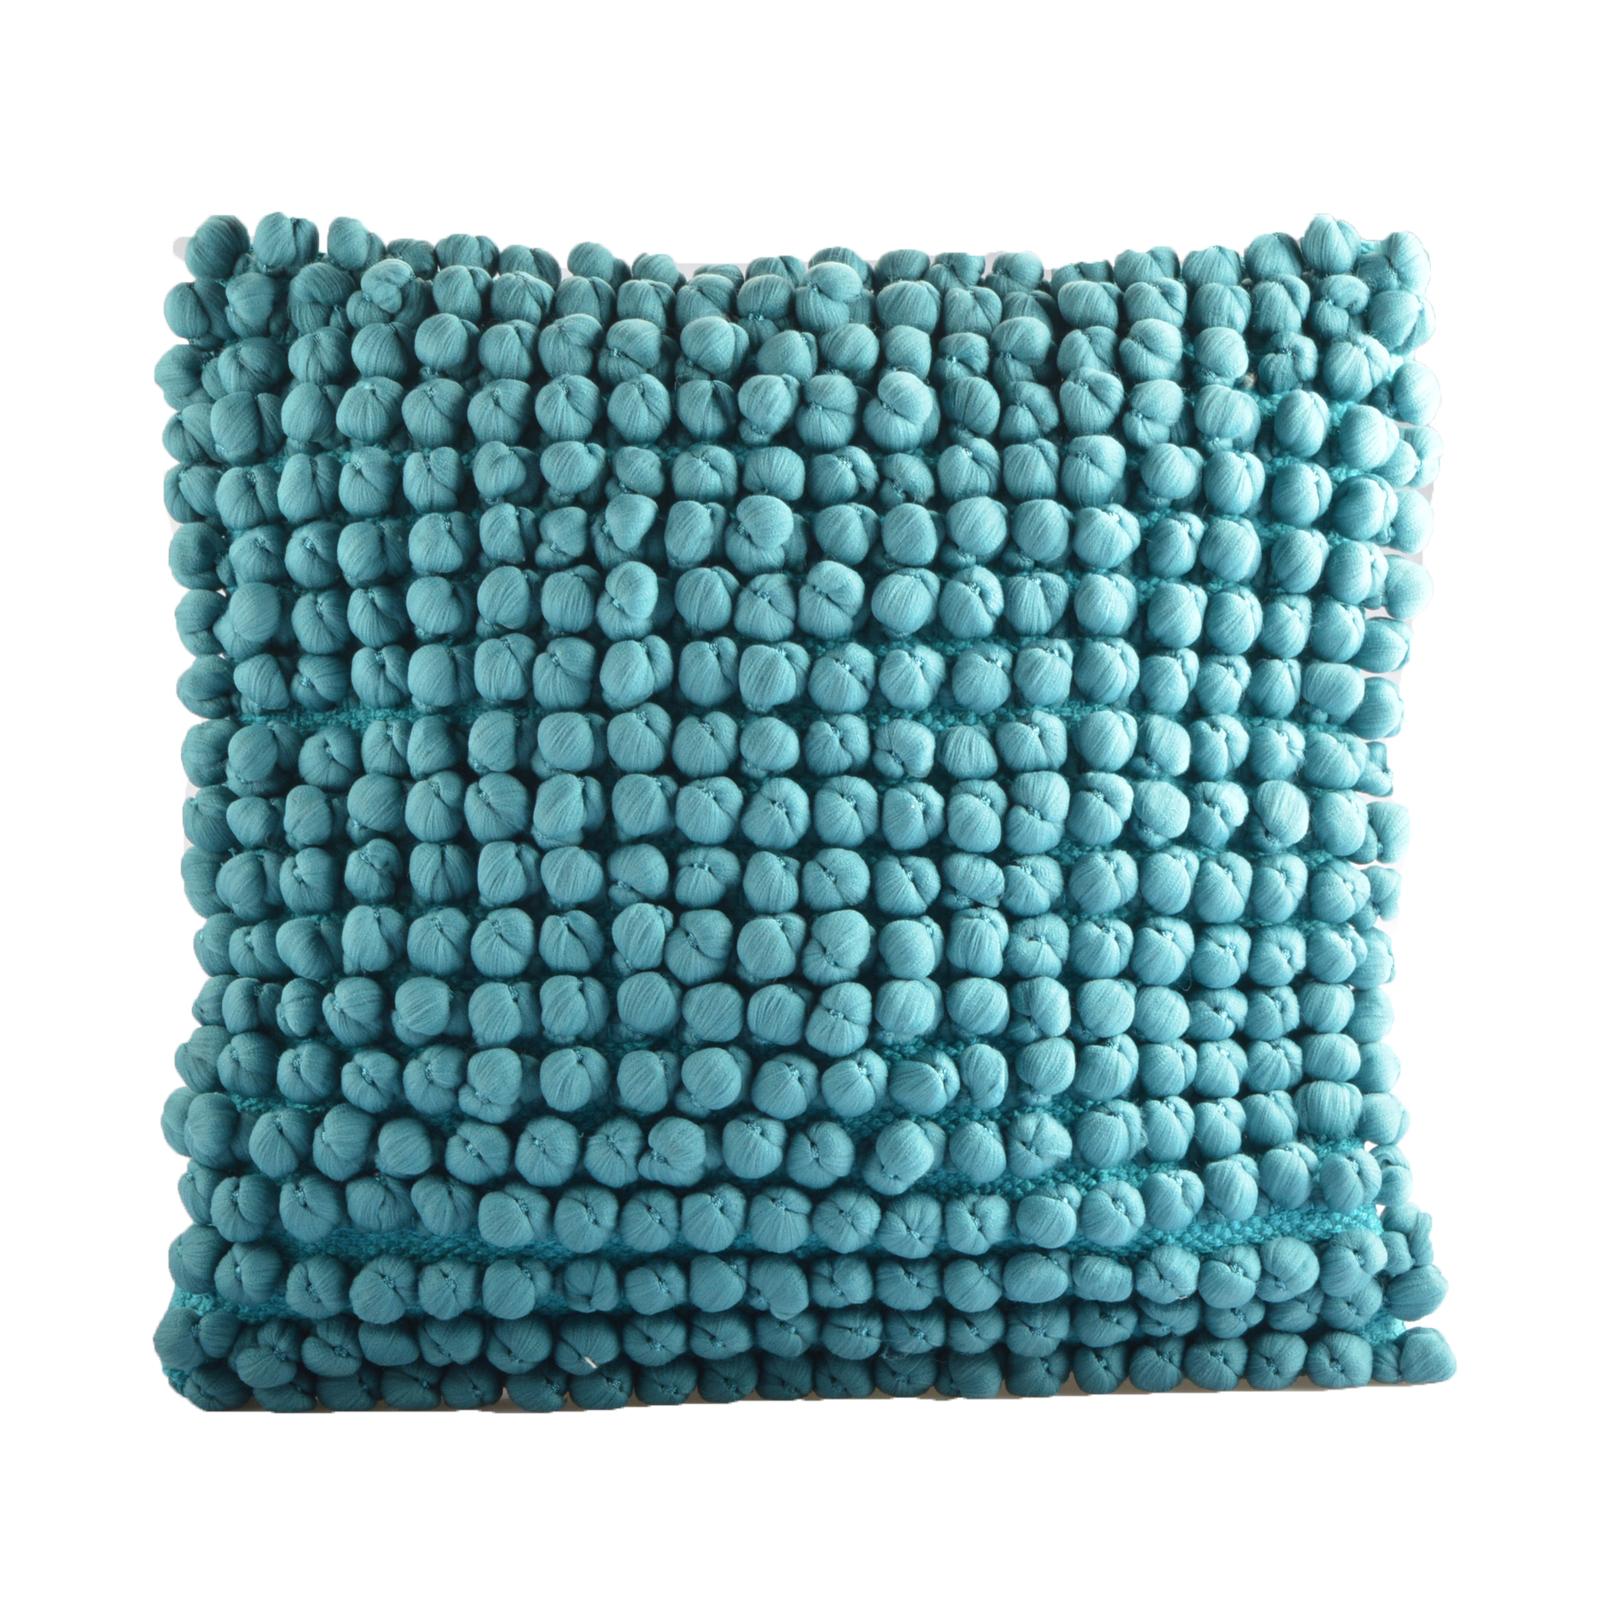 5 farben kissenh lle noppen dekokissen kissenbezug deko bezug 40 x 40 cm ebay. Black Bedroom Furniture Sets. Home Design Ideas